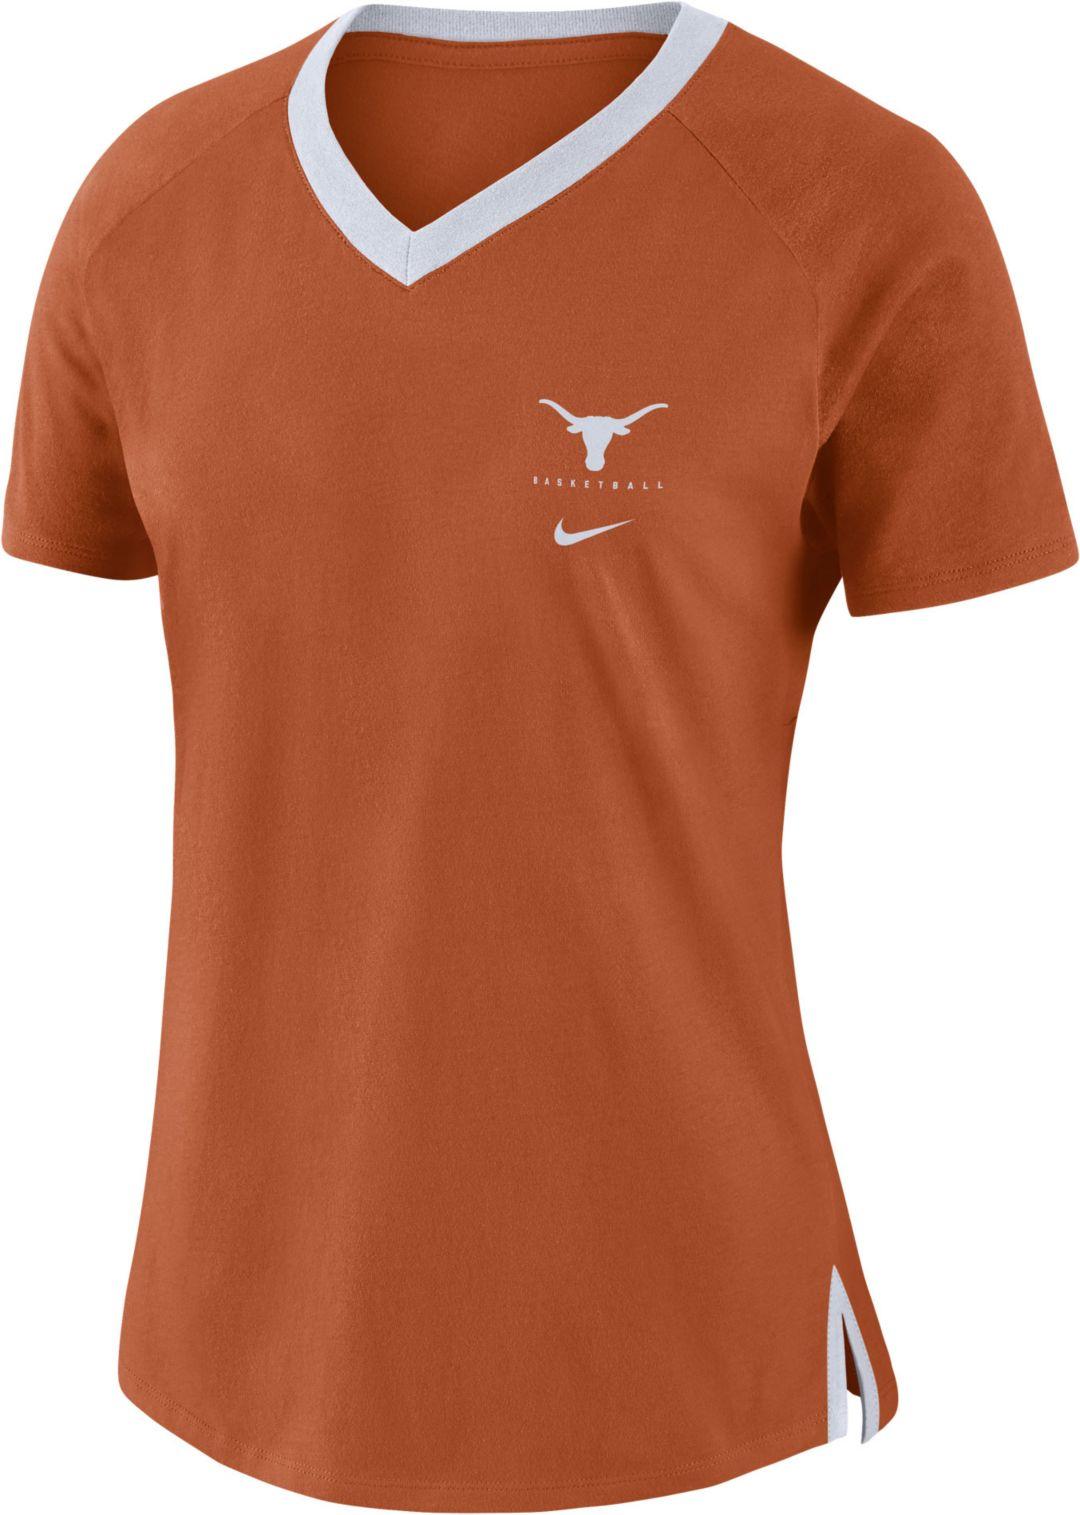 super popular a53f1 aba3f Nike Women s Texas Longhorns Burnt Orange Tri-Blend Basketball Fan T-Shirt.  noImageFound. Previous